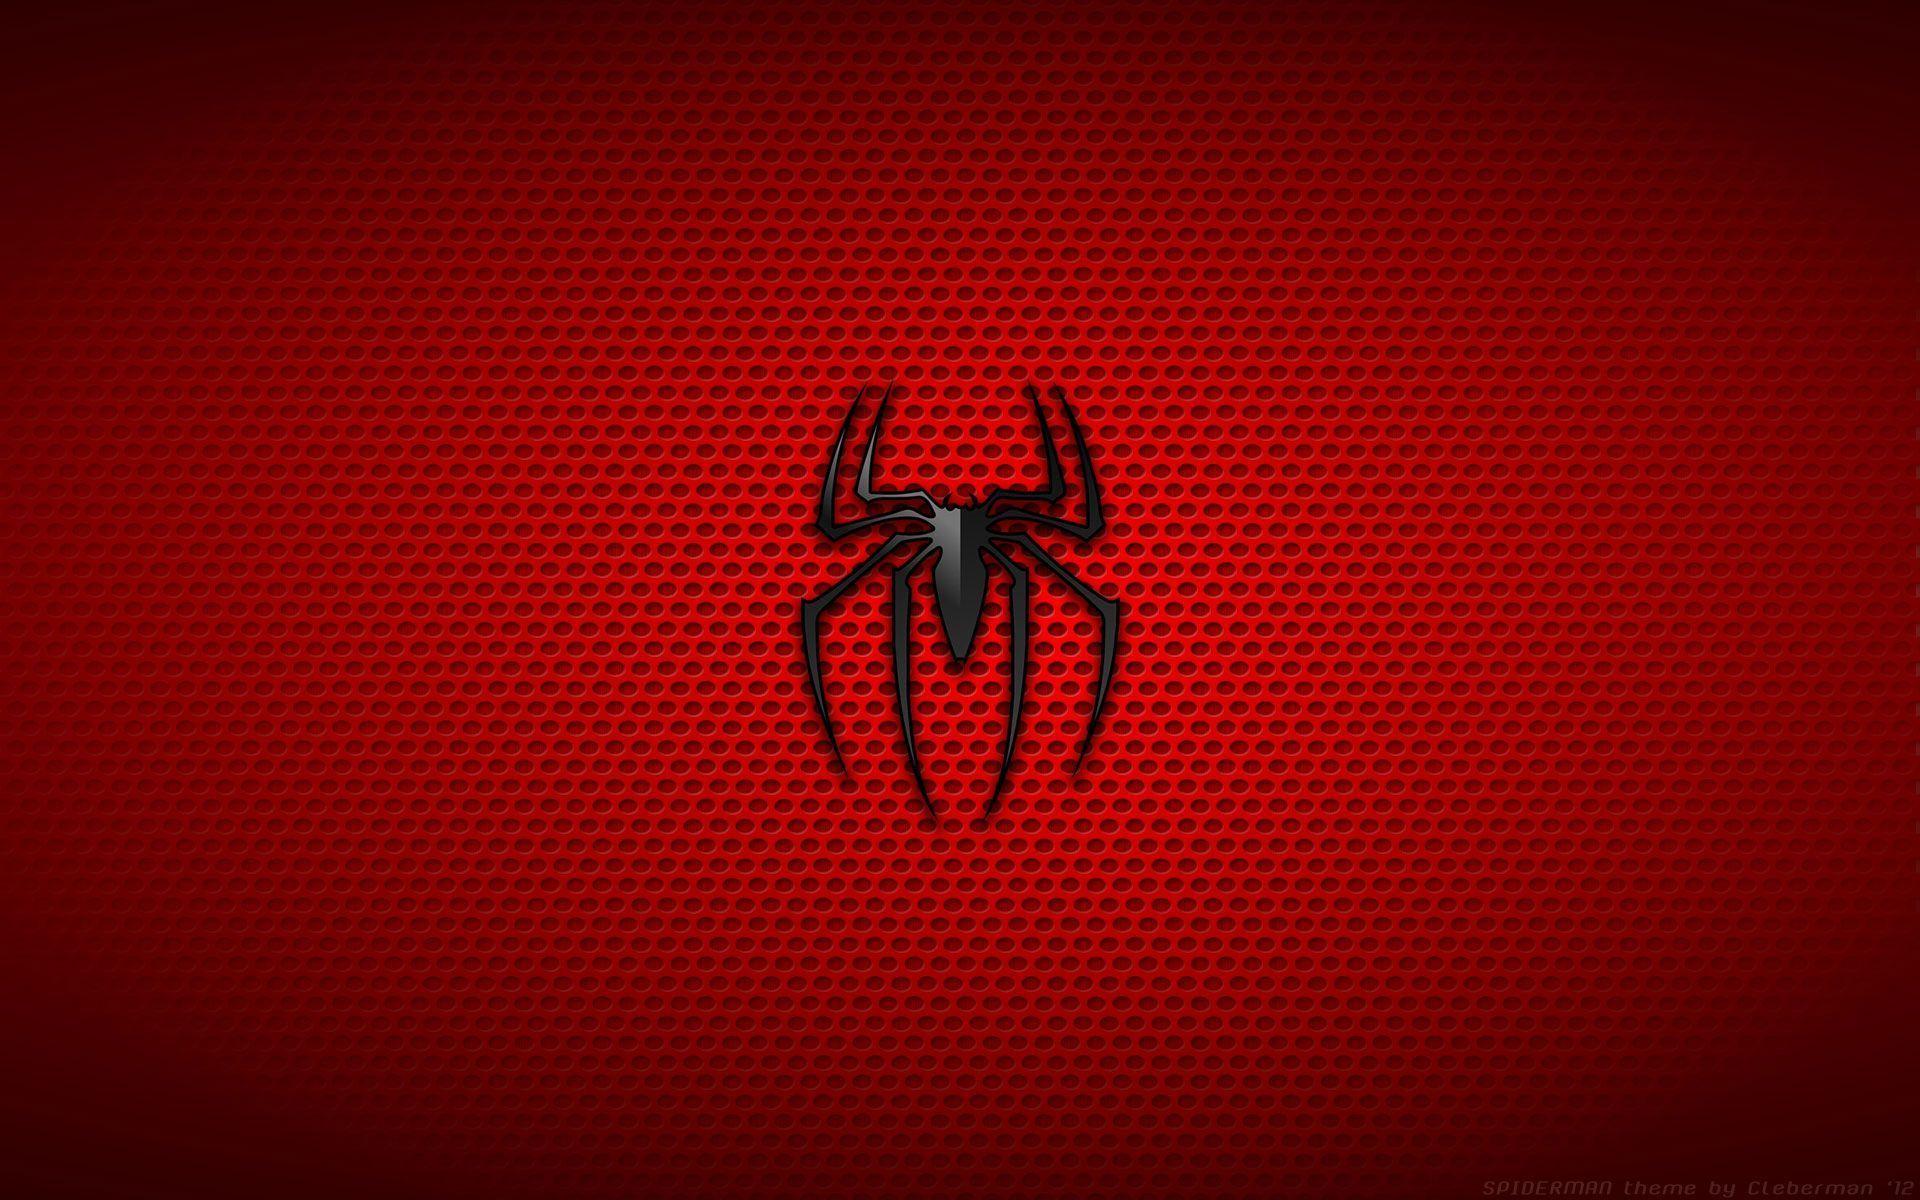 spiderman logo hd wallpaper 1920x1080 via classy bro cool